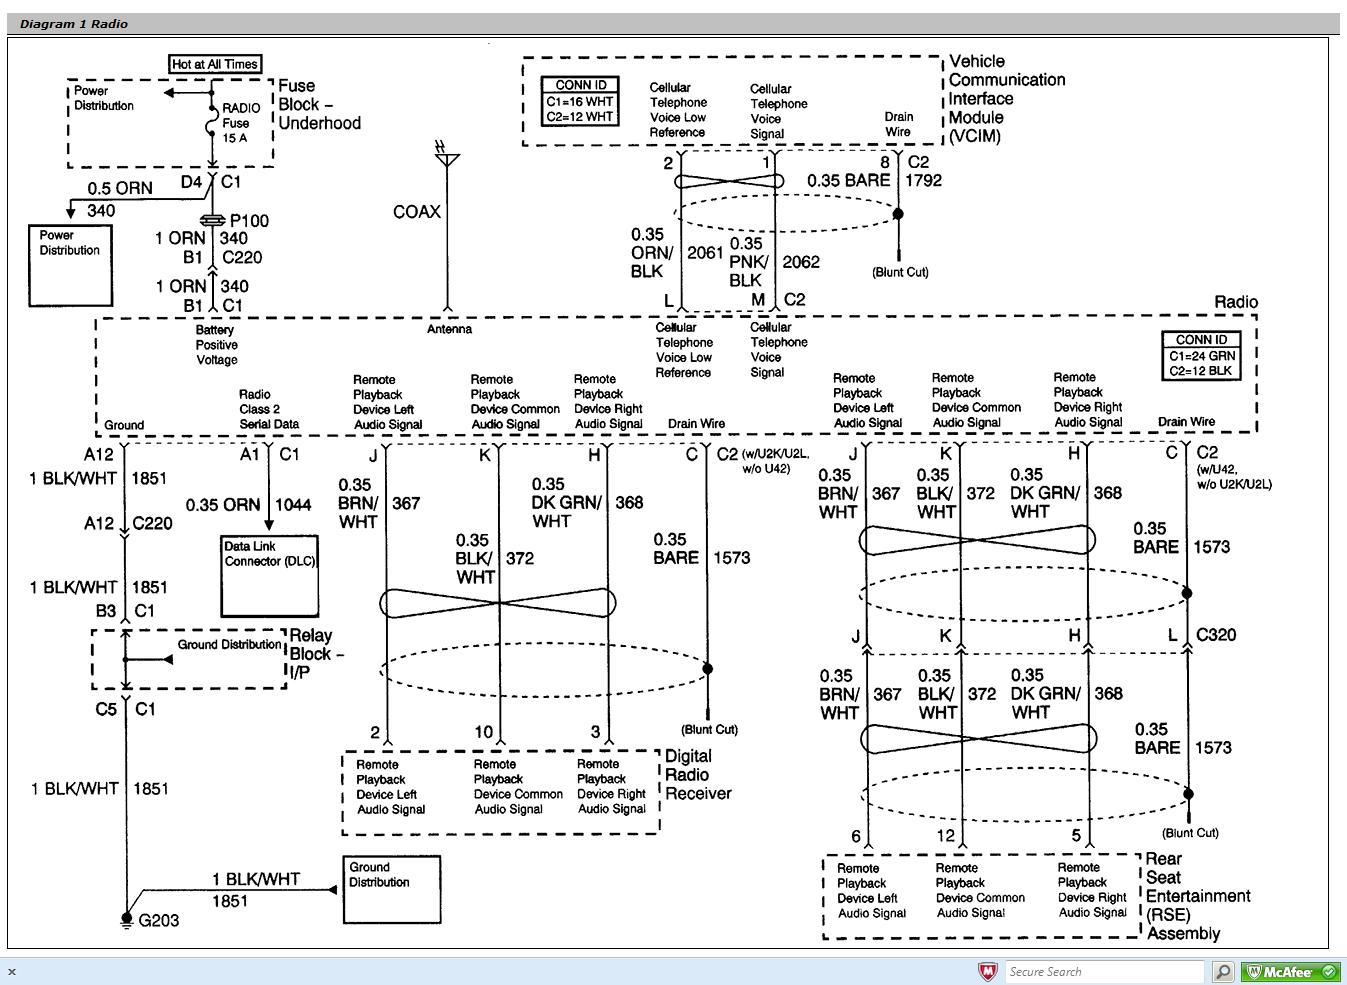 [FPWZ_2684]  2004 Gmc Yukon Wiring Diagrams - Melex Golf Cart 36 Volt System Wiring  Diagram for Wiring Diagram Schematics | 2000 Yukon Wiring Diagram |  | Wiring Diagram Schematics